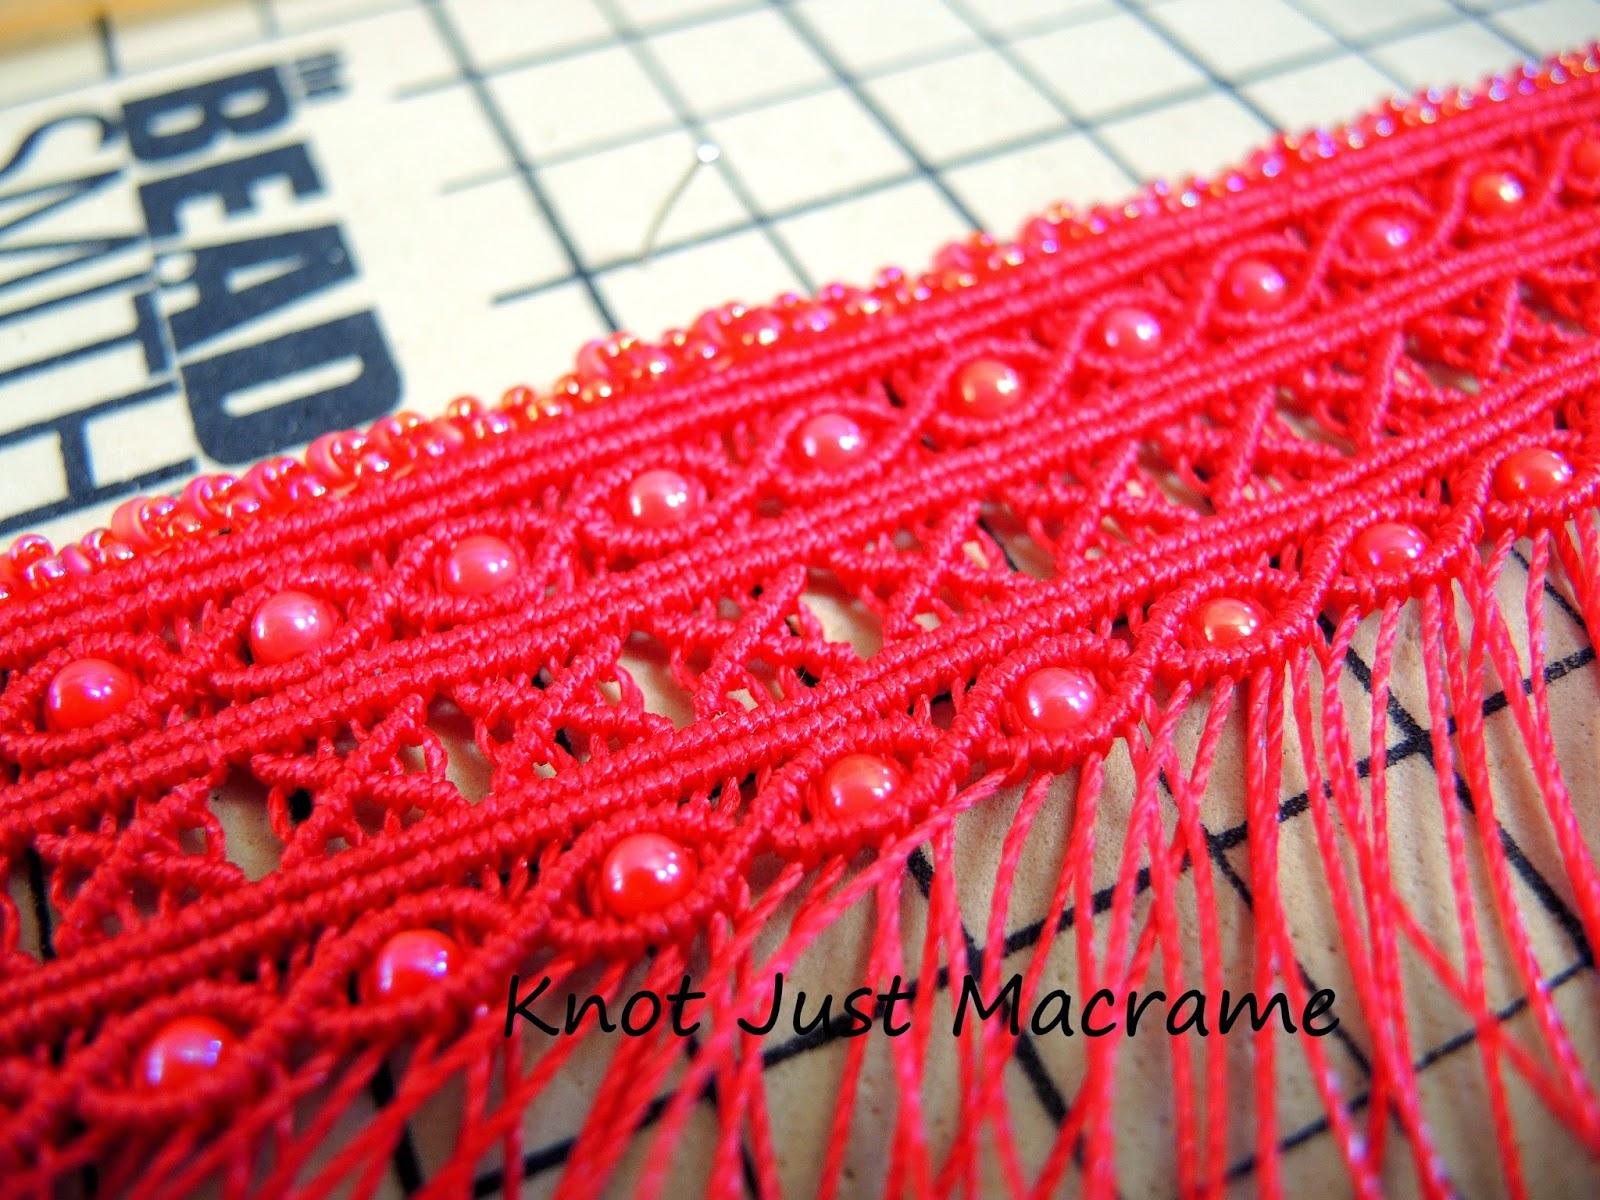 Micro macrame cuff design from Knot Just Macrame.